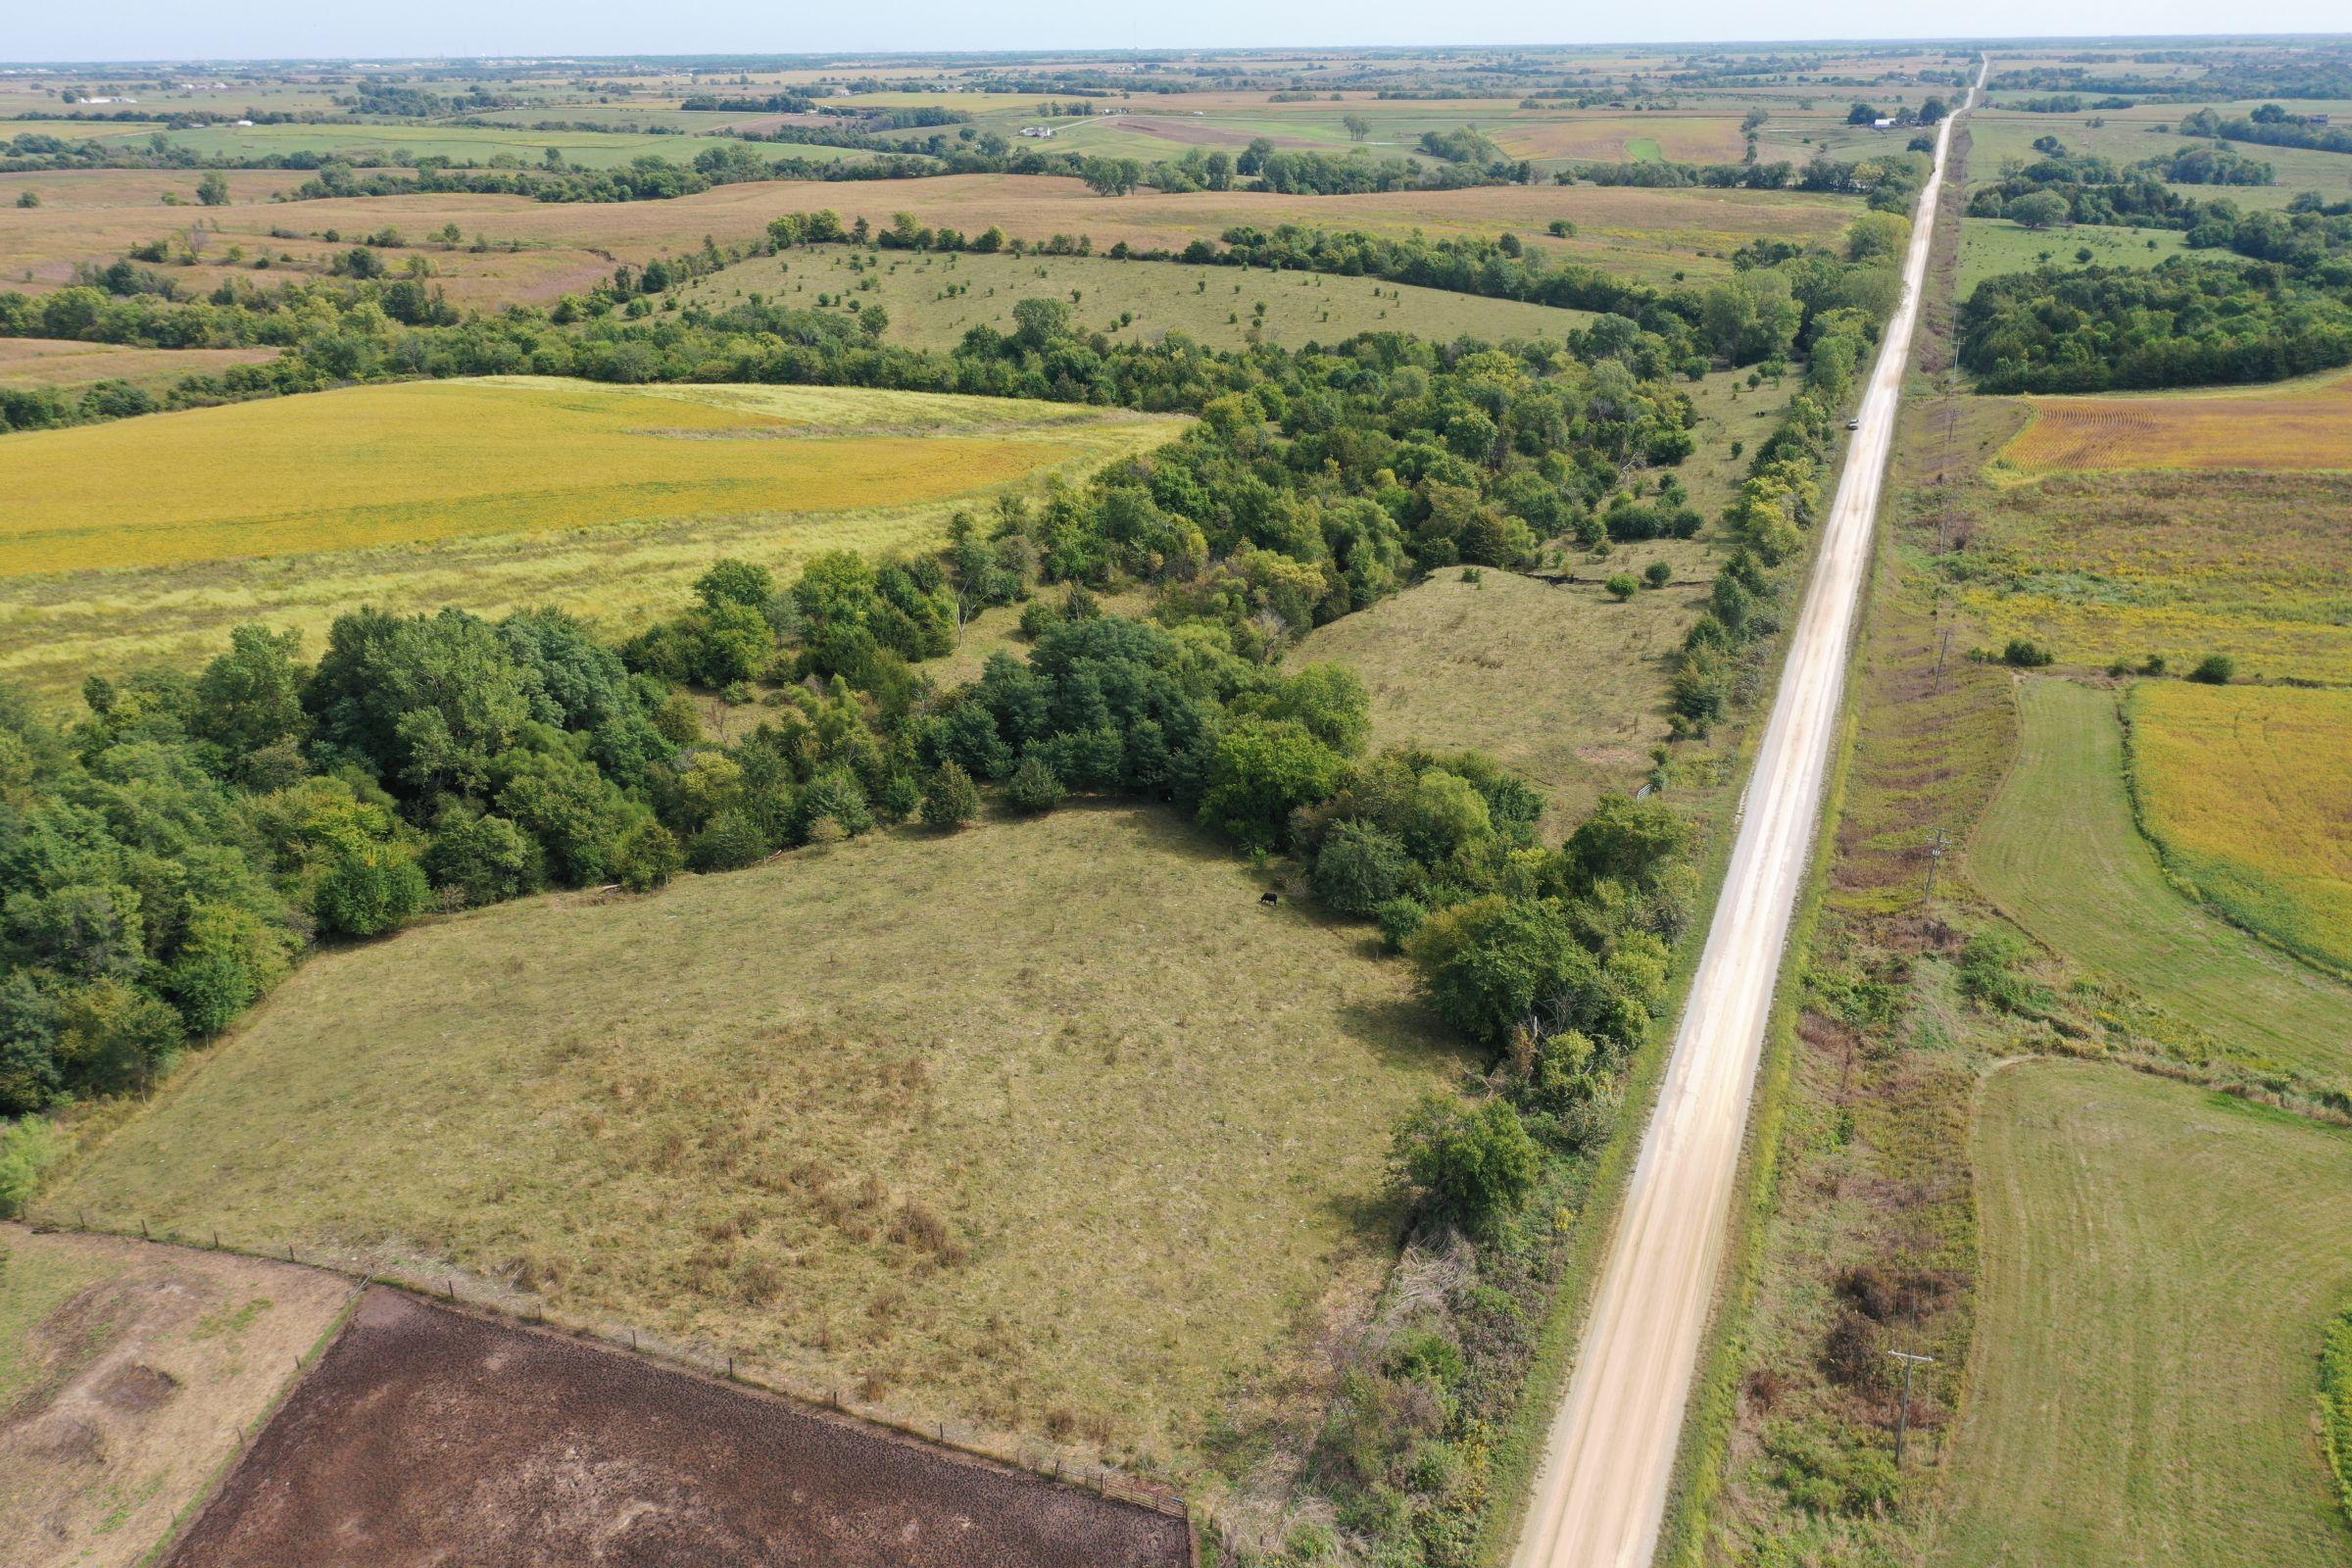 clarke-county-iowa-37-acres-listing-number-15398-3-2021-03-08-151154.jpg